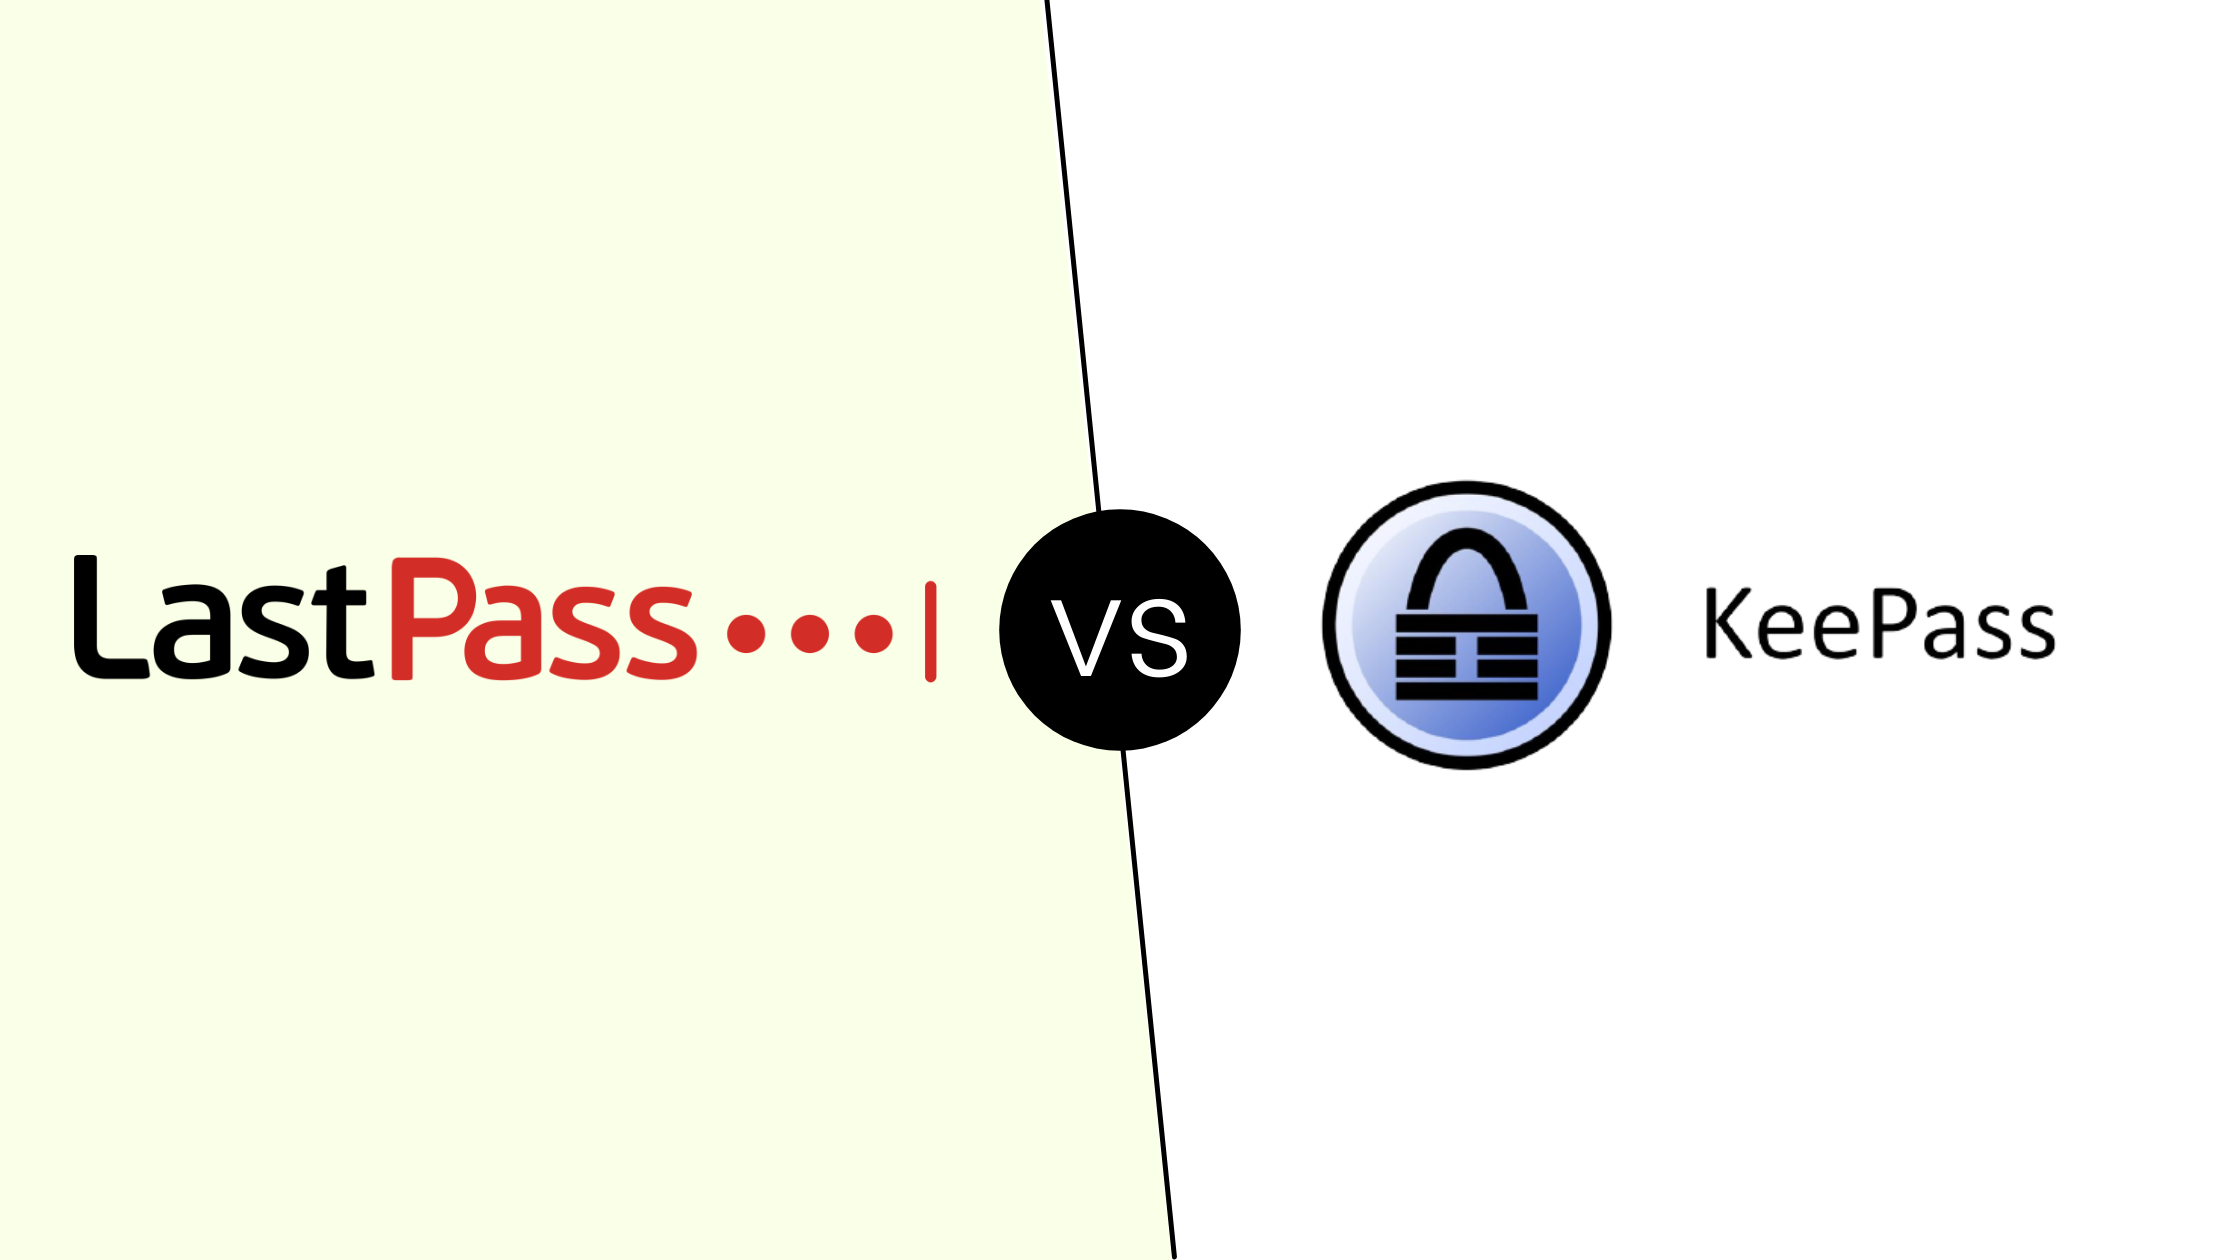 Lastpass vs Keepass